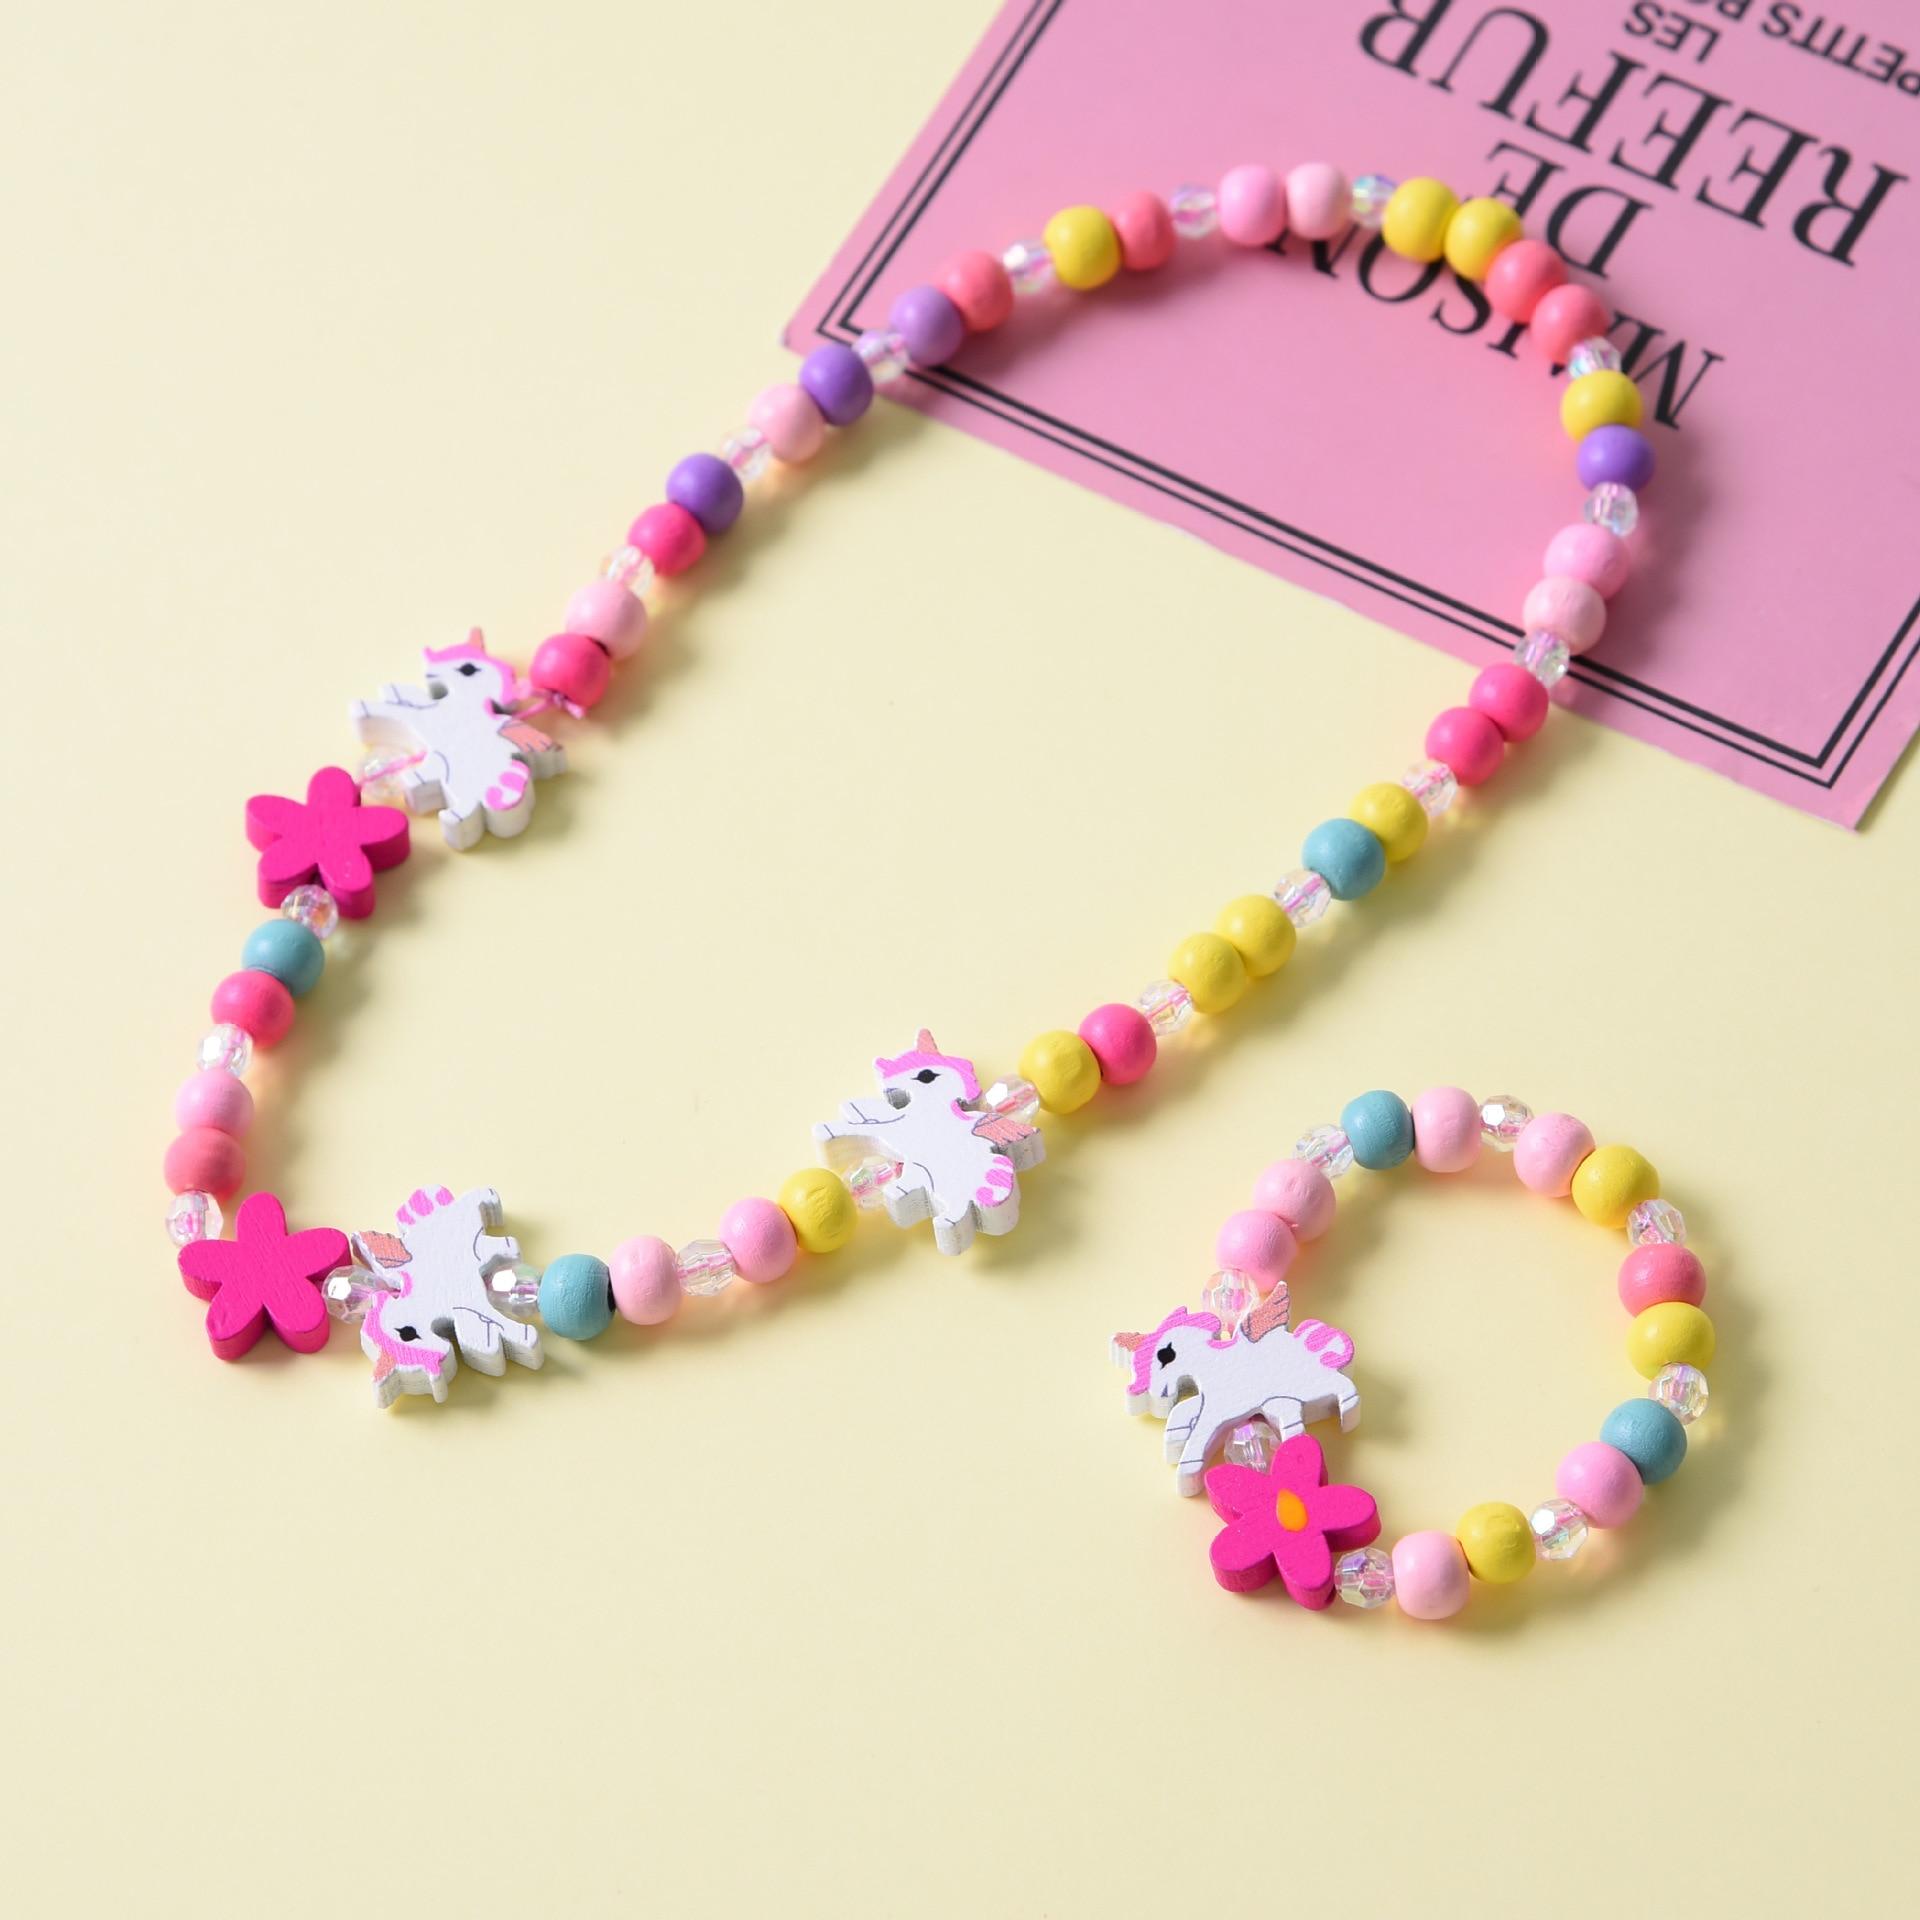 Cute Cartoon Wooden Flower Animal Child Sweater Necklace Bracelet Girl's Gifts Children Jewelry